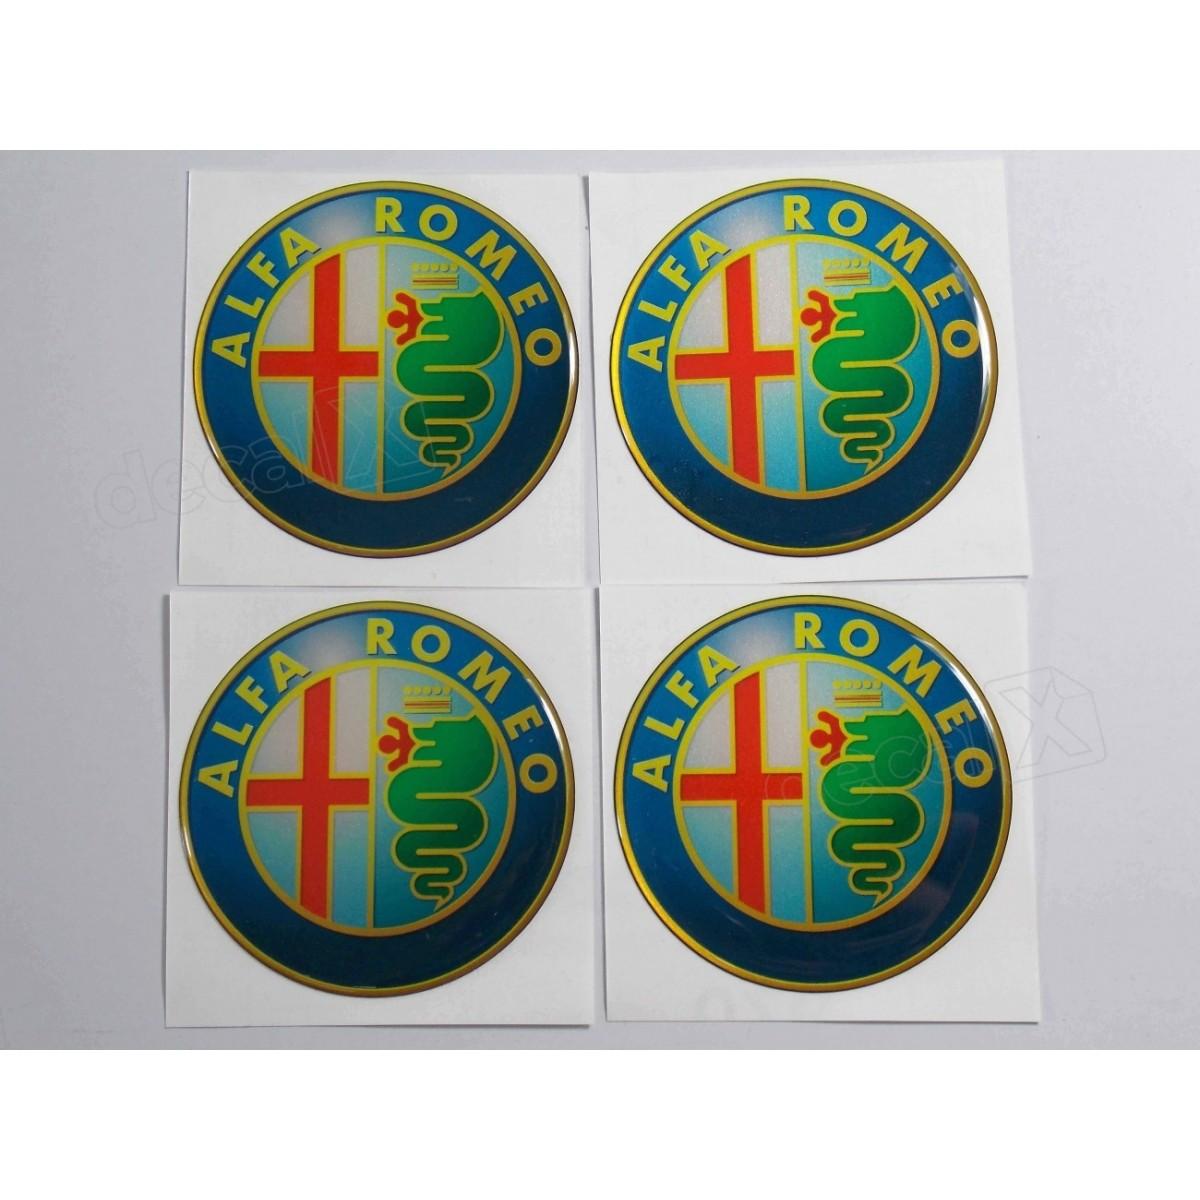 Adesivo Emblema Resinado Roda Alfa Romeo 68mm - Cl3 - Decalx